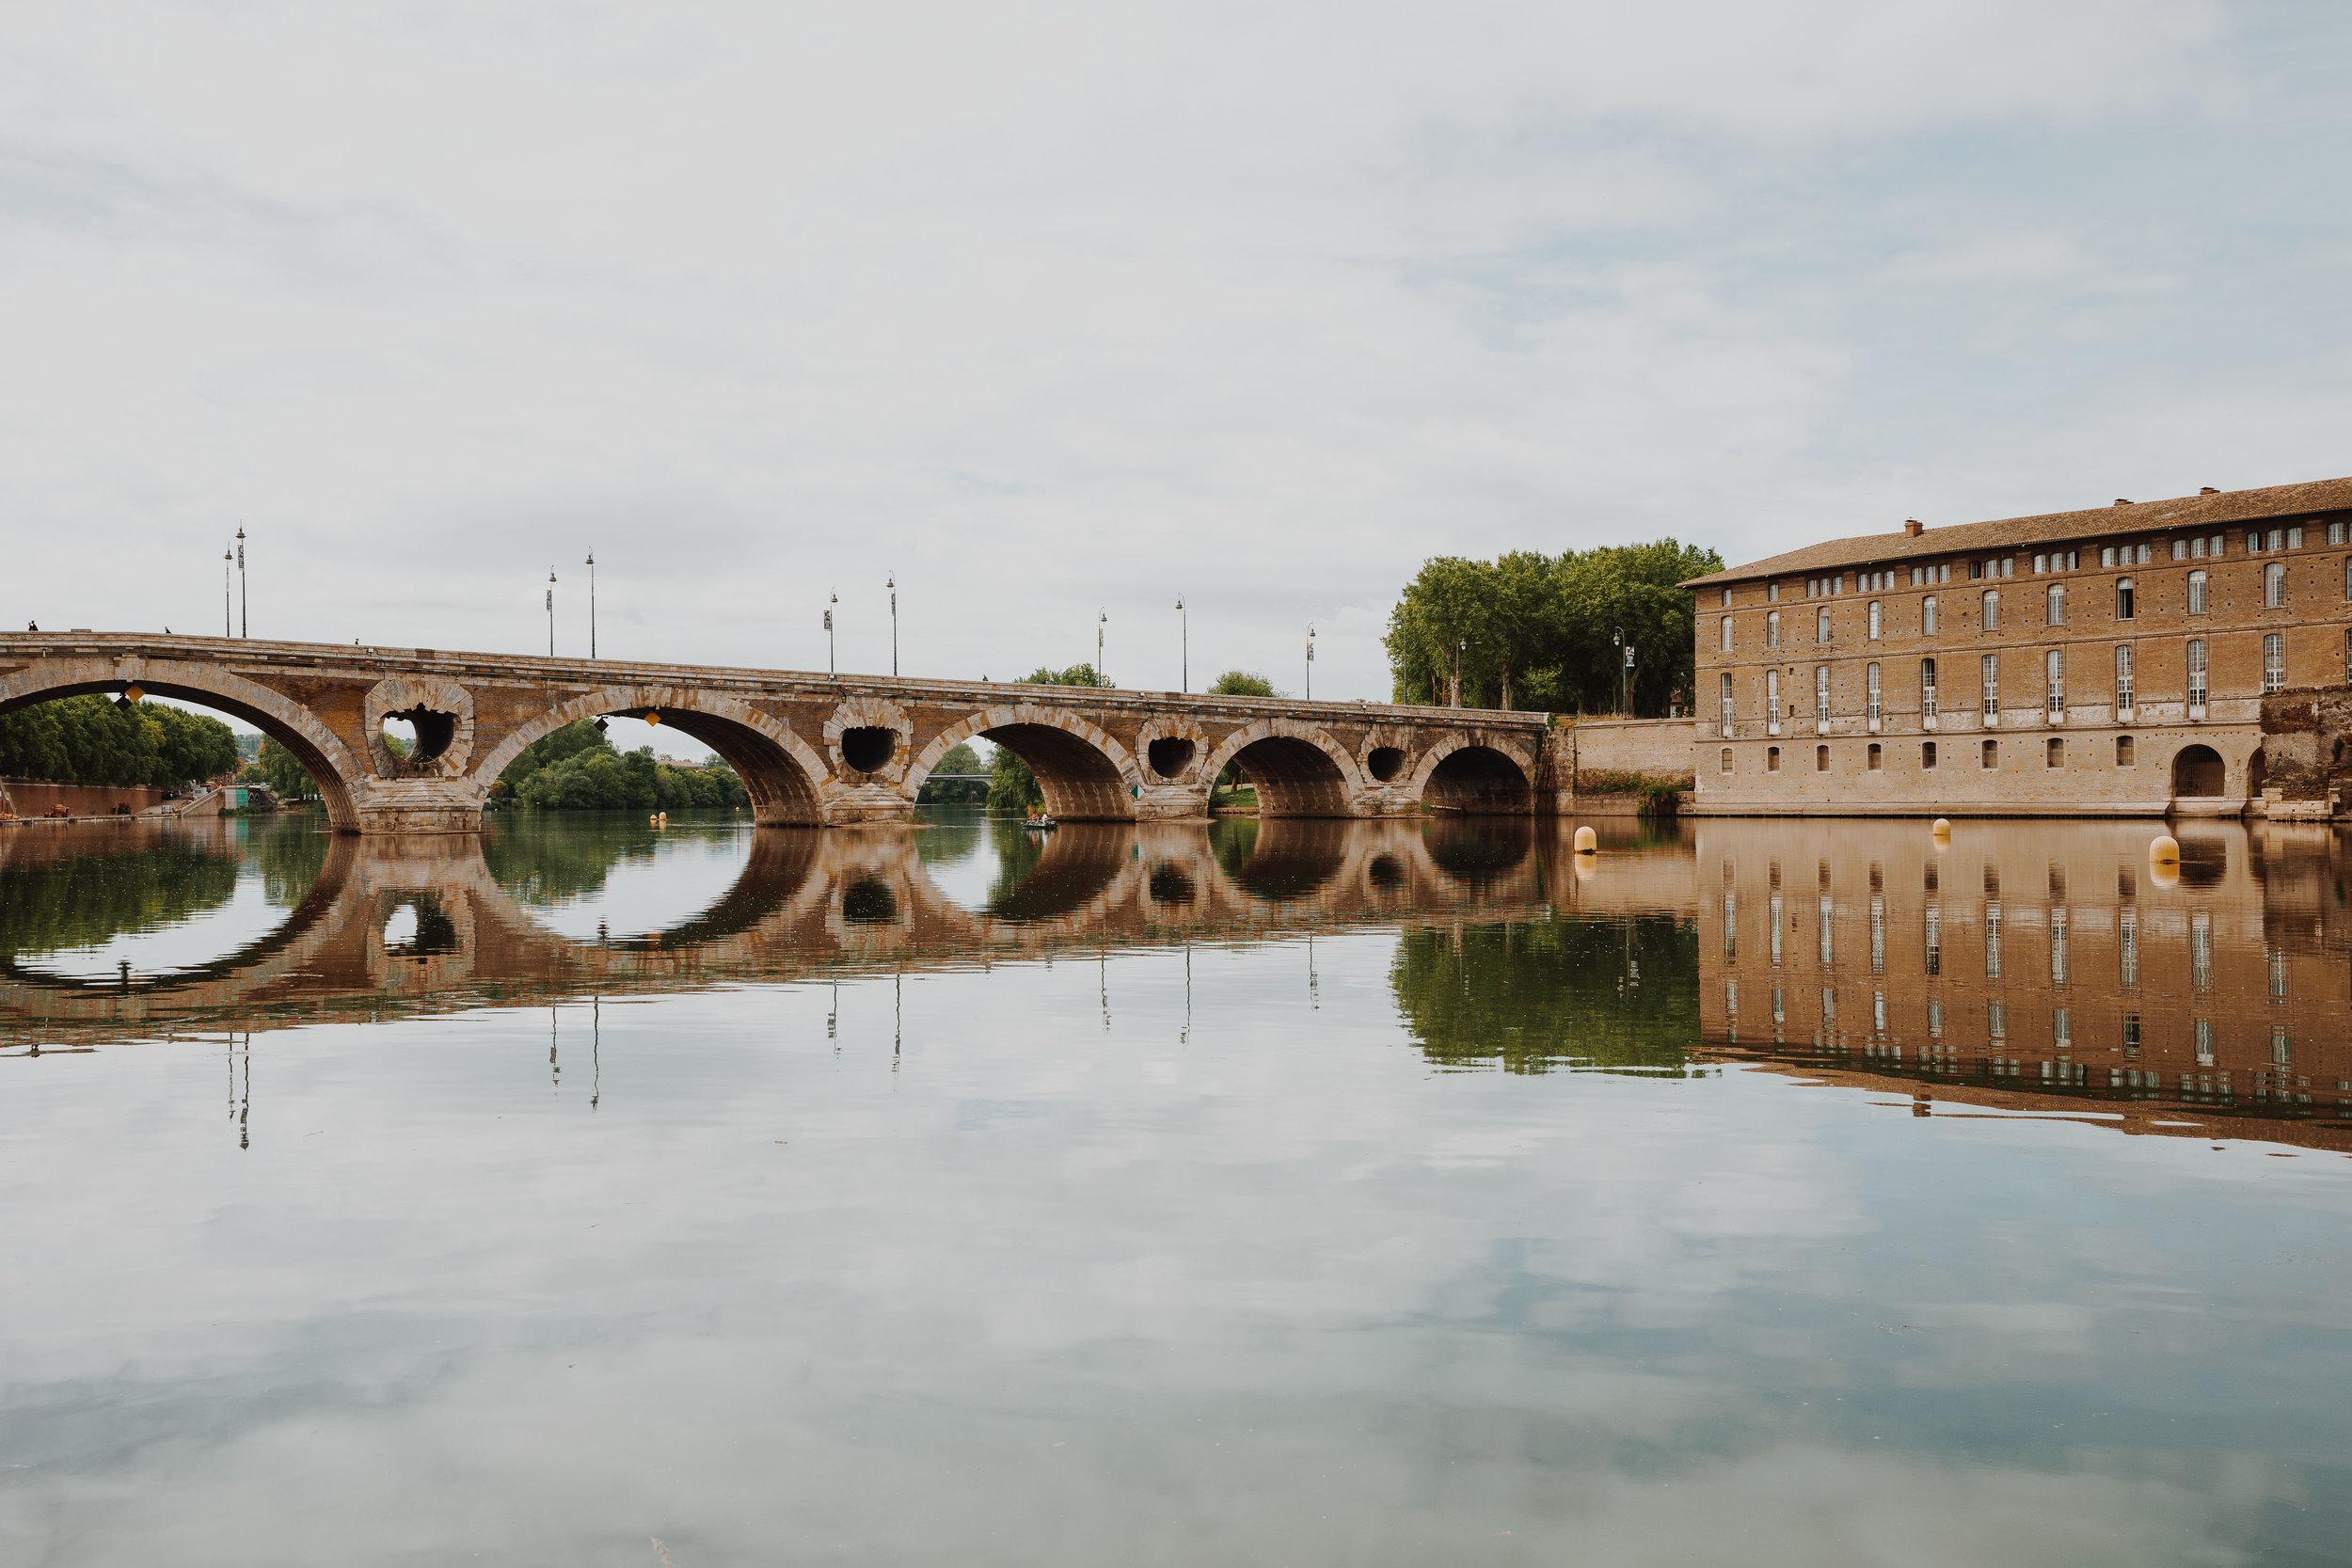 ASROSENVINGE_AtoutFrance_Occitanie_Toulouse_LowRes-204.jpg